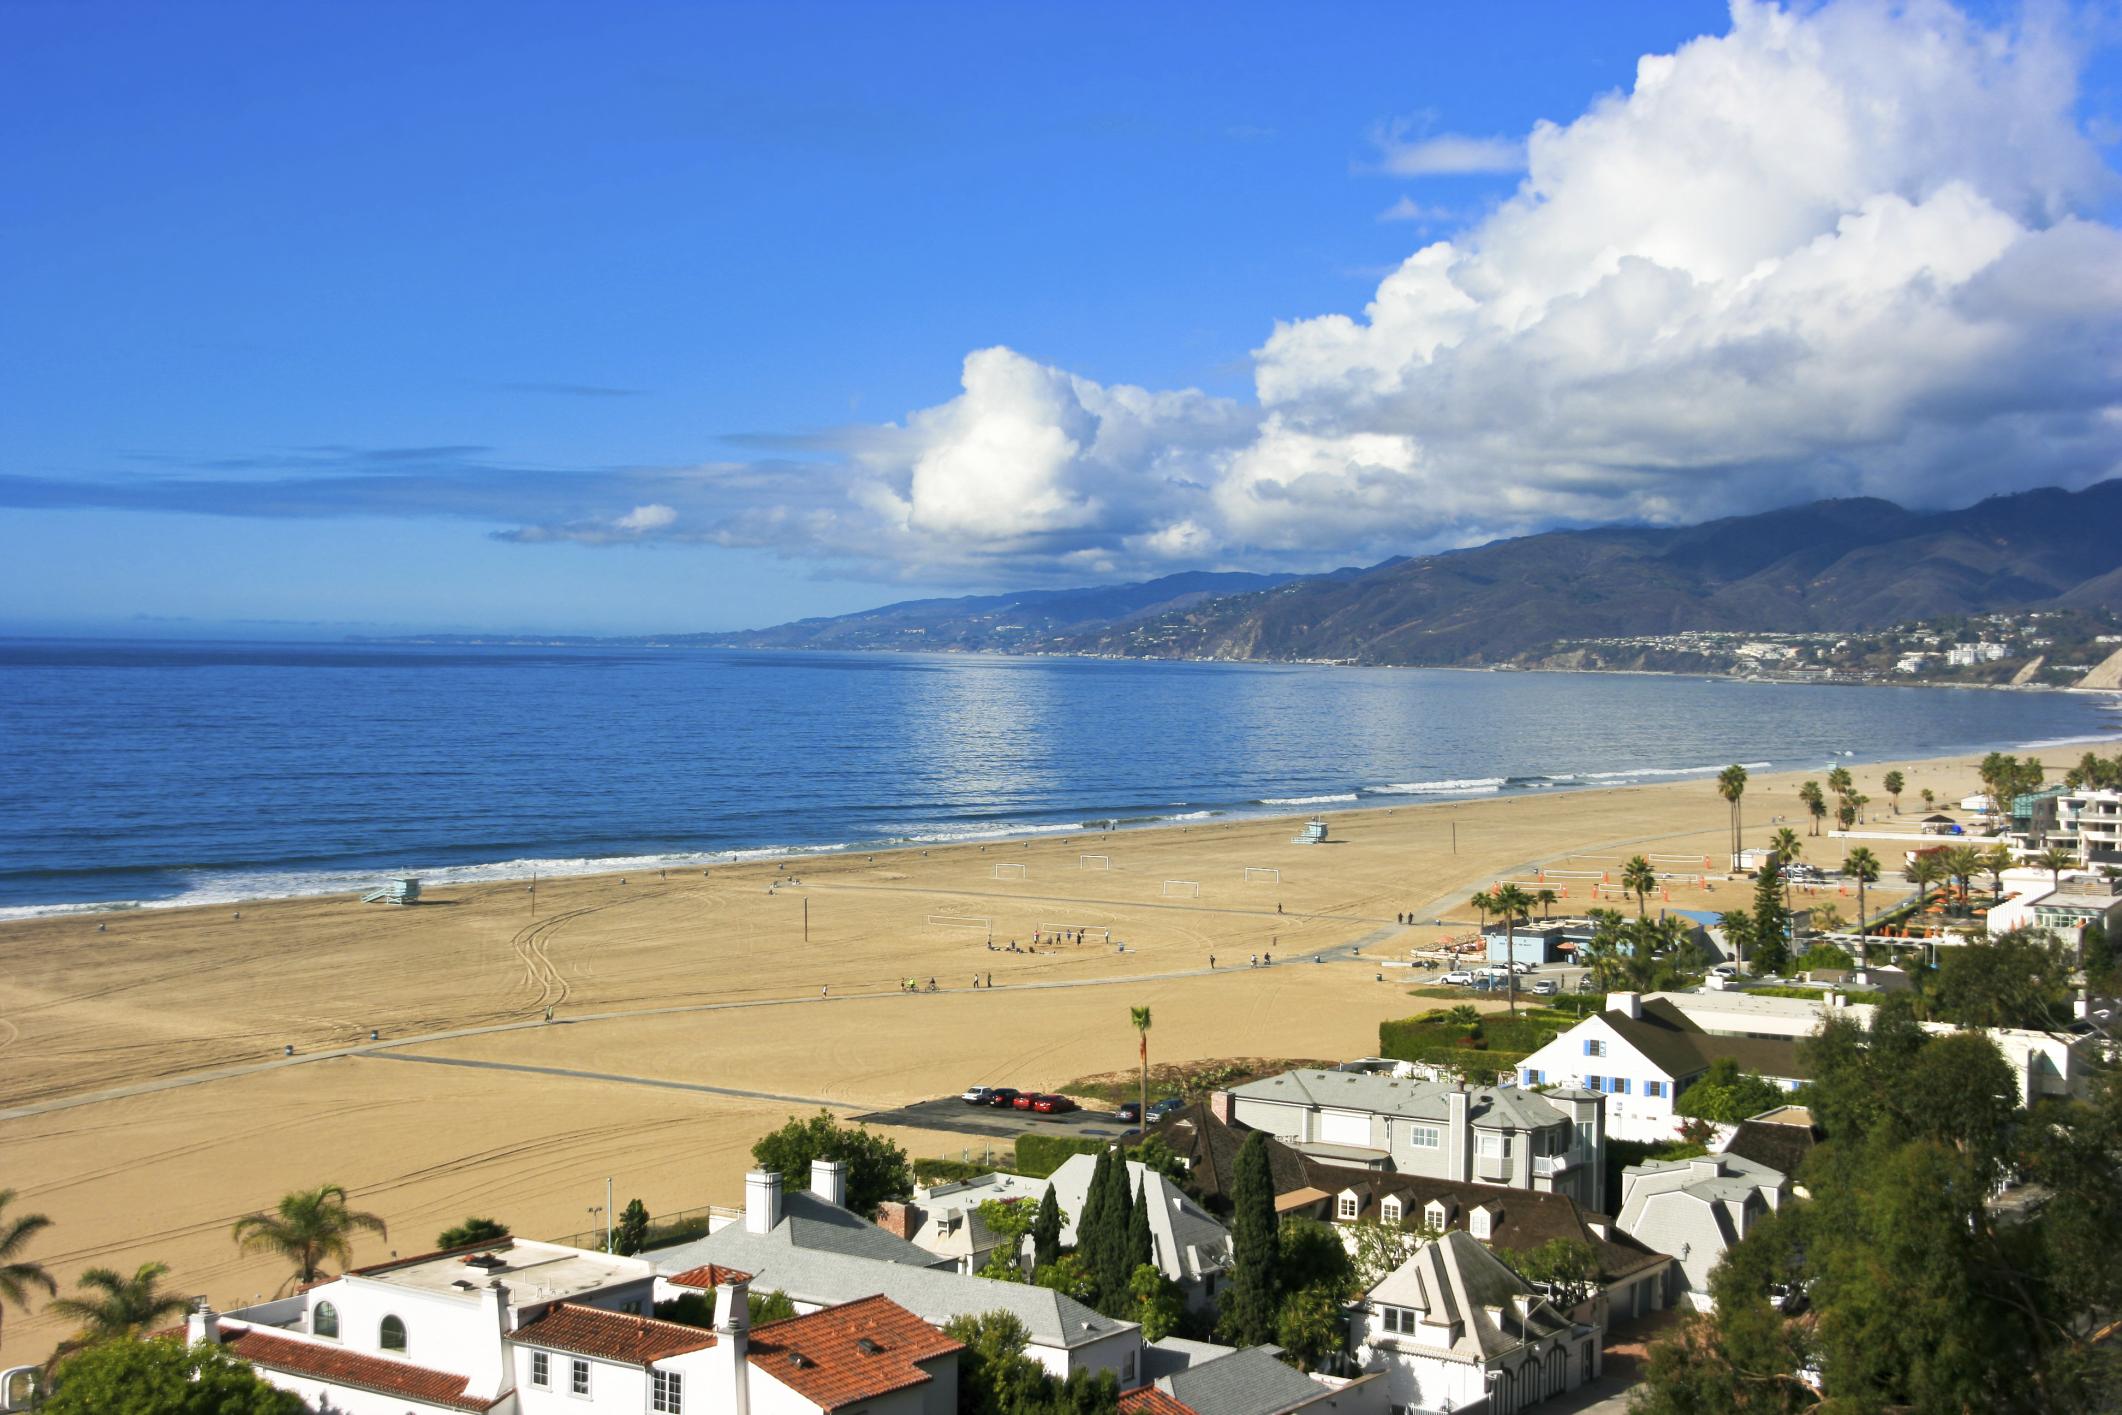 Weekend getaways in southern california for mother for Best mother daughter weekend getaways